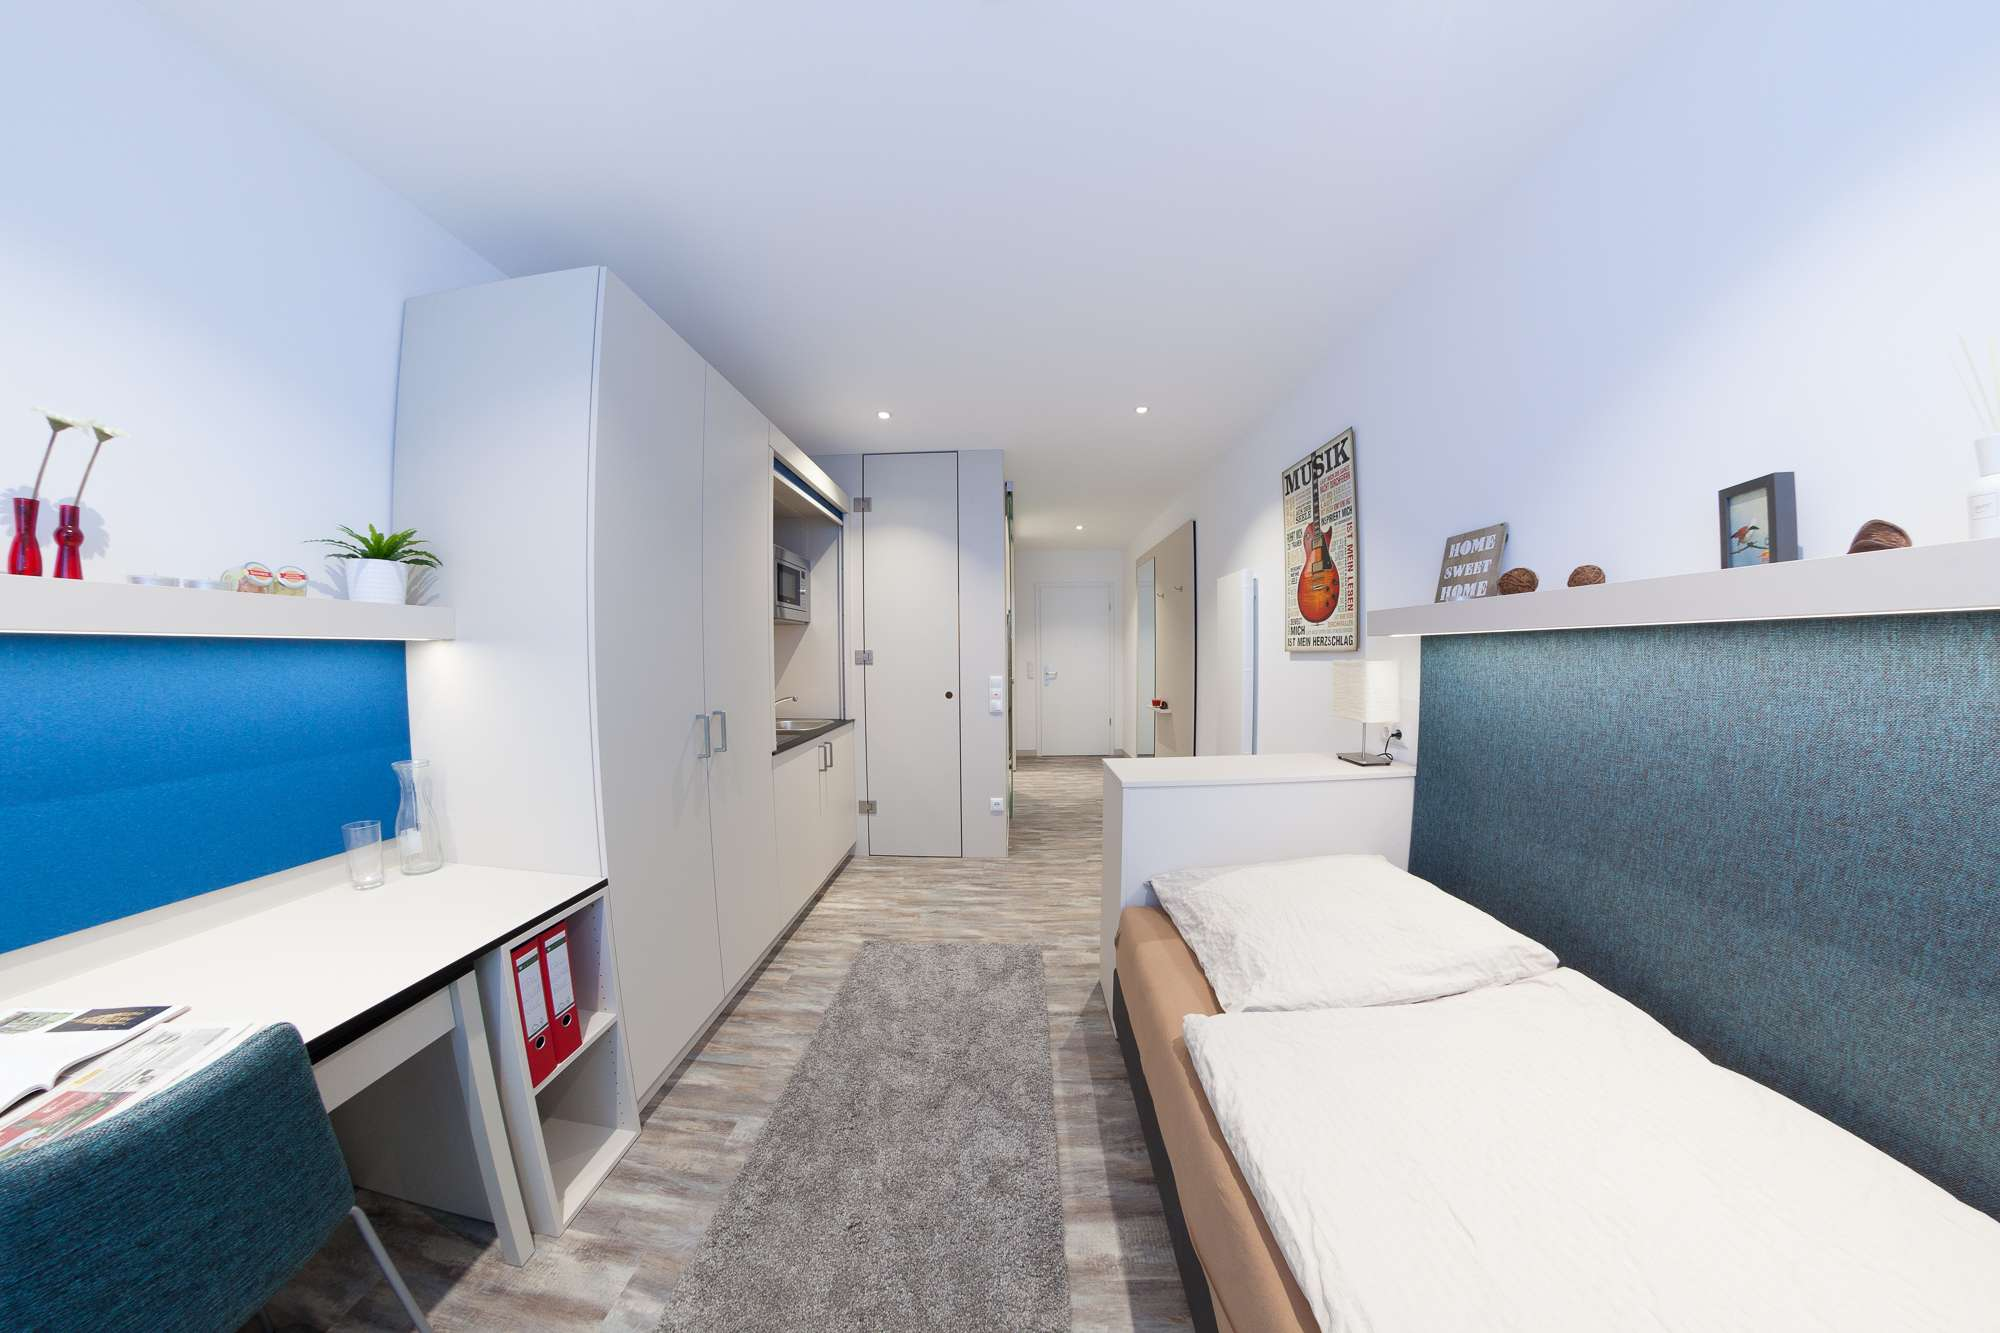 Azubis, Schüler, Doktoranten aufgepasst! Moderne möblierte (Studenten) Appartements zu vermieten in Erlangen - Zentrum (Erlangen)